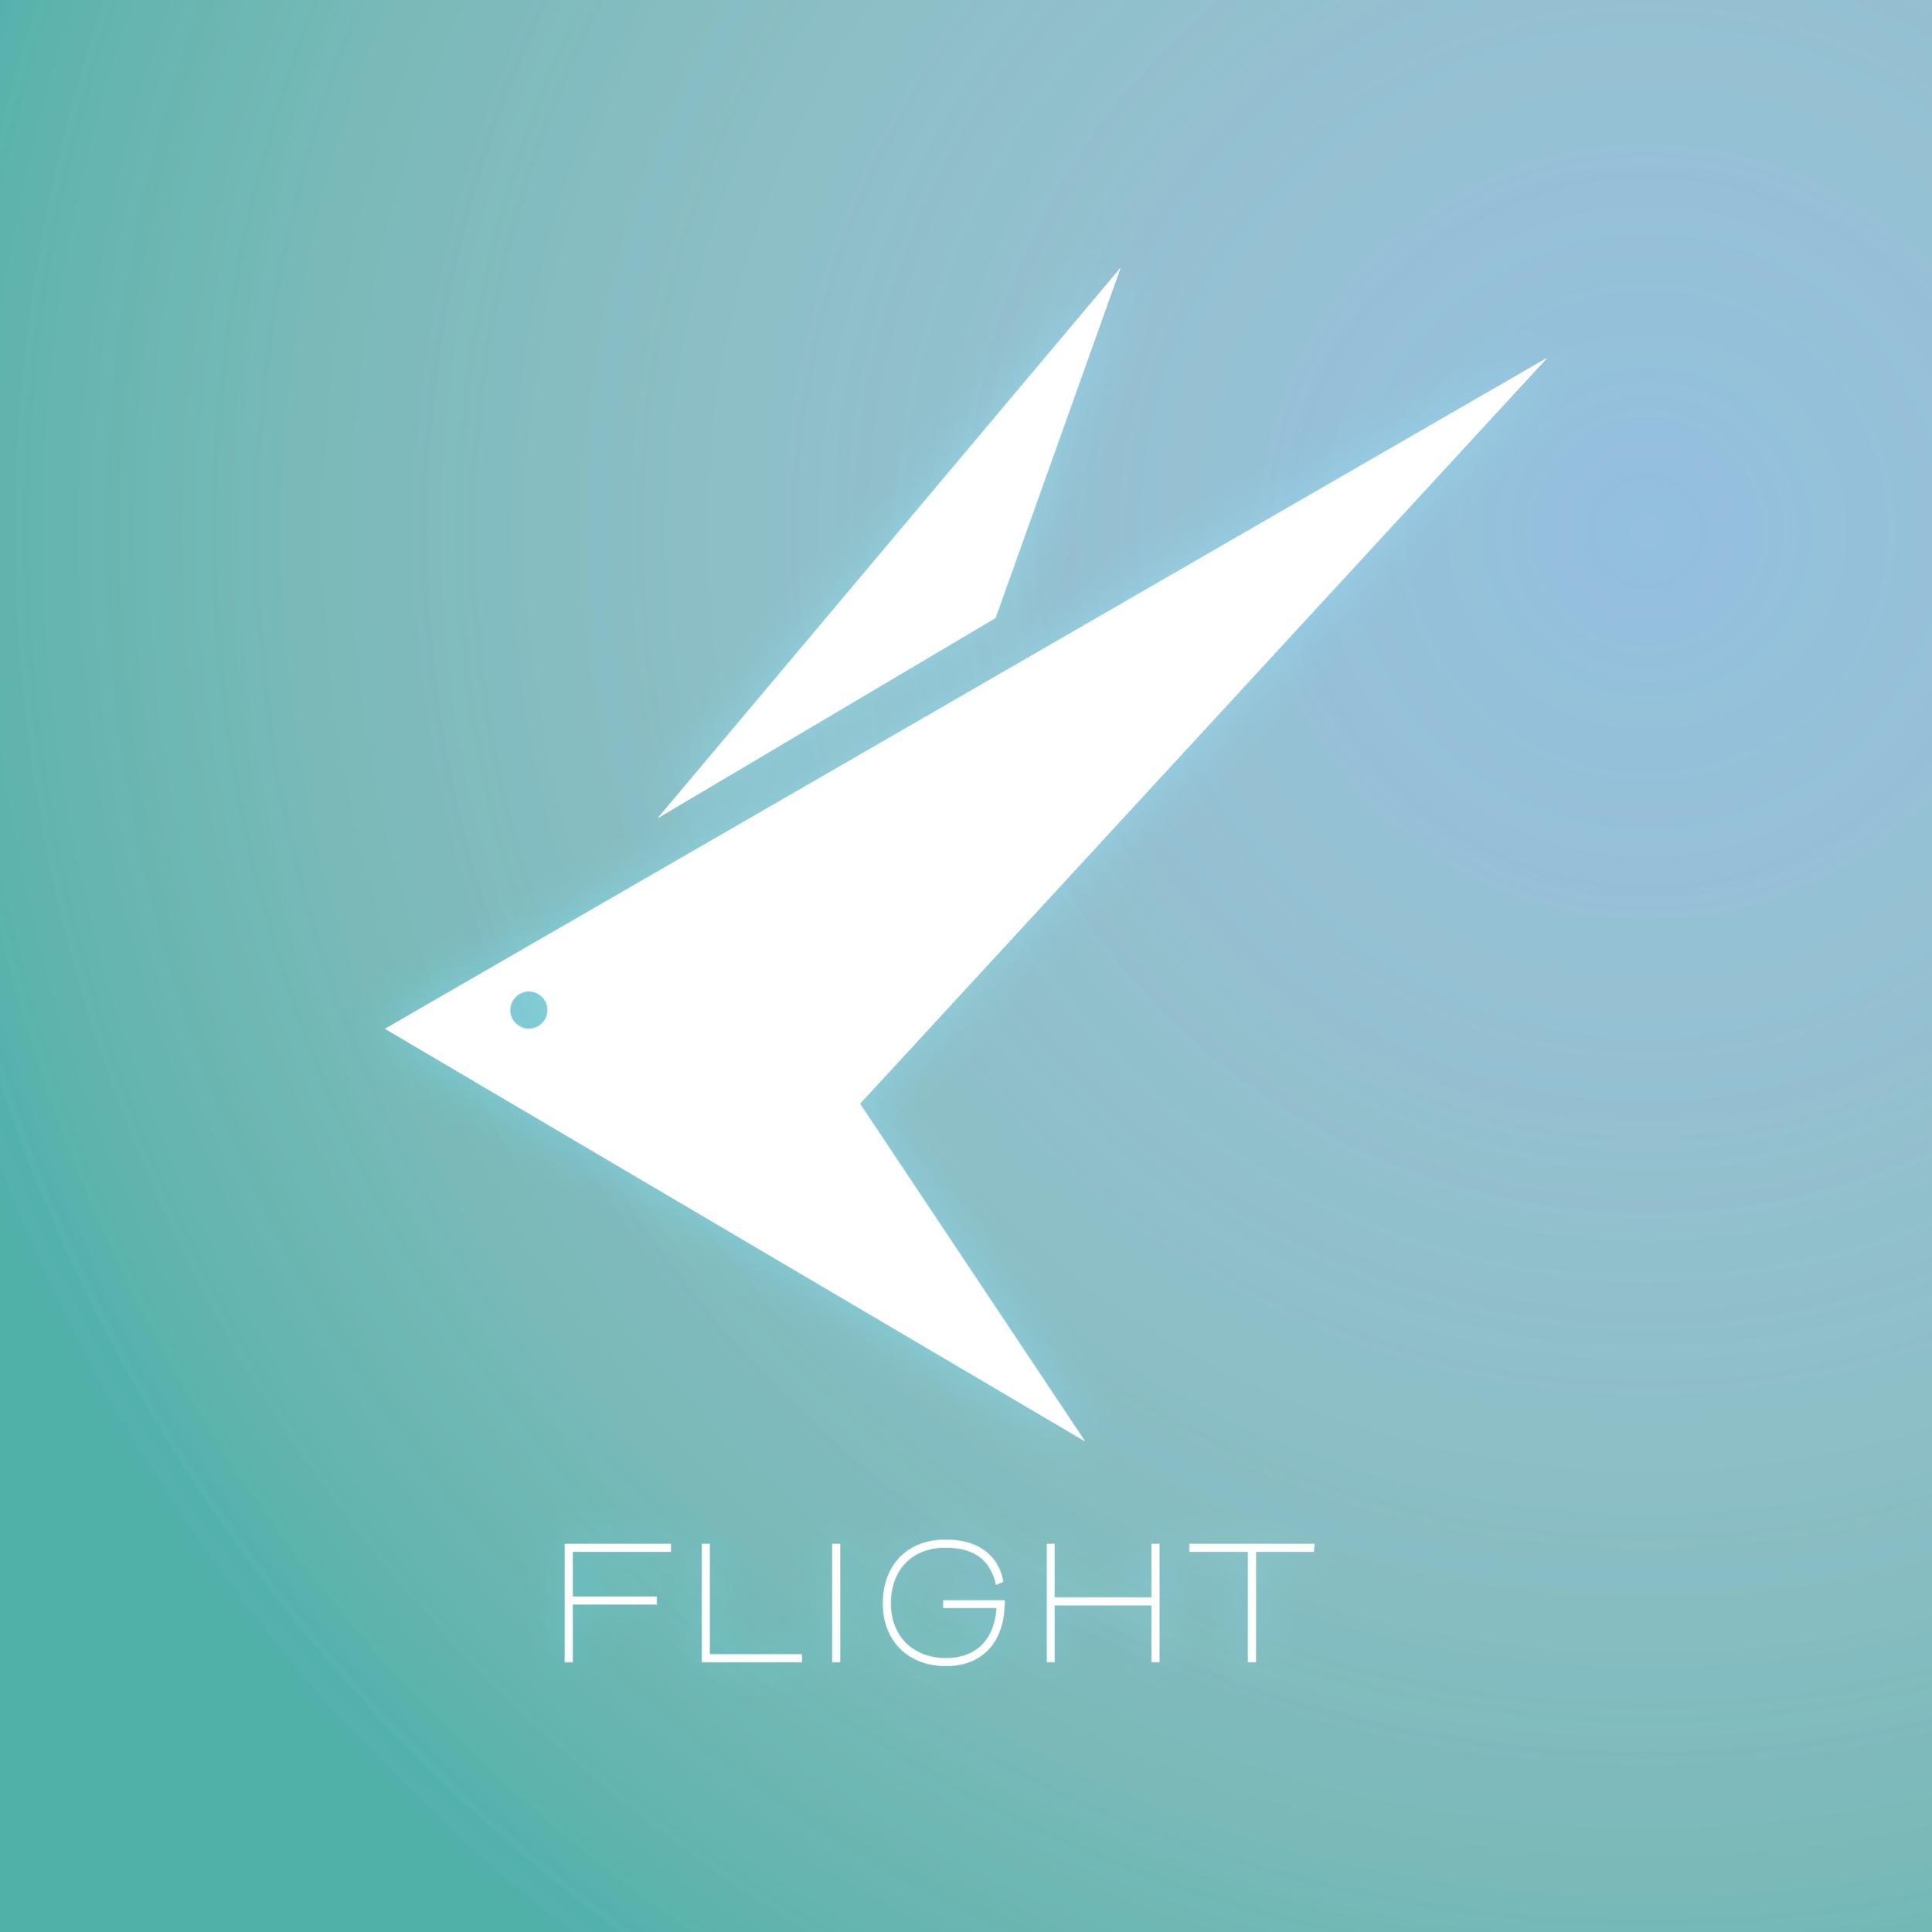 FLIGHT!.png